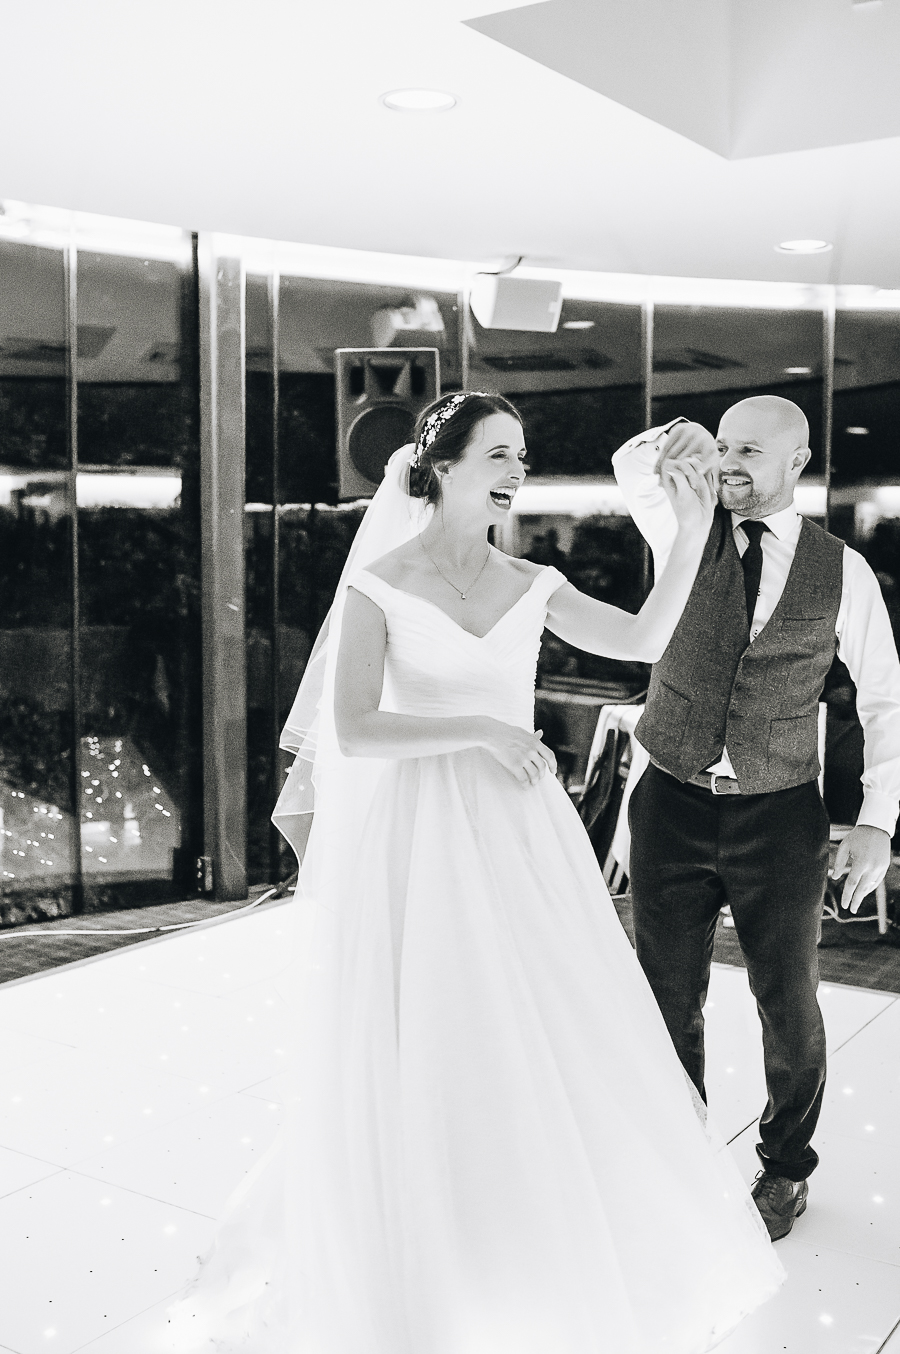 OurBeautifulAdventure-FairyhillWedding-John&Zoe-WeddingBlog-2-30.jpg